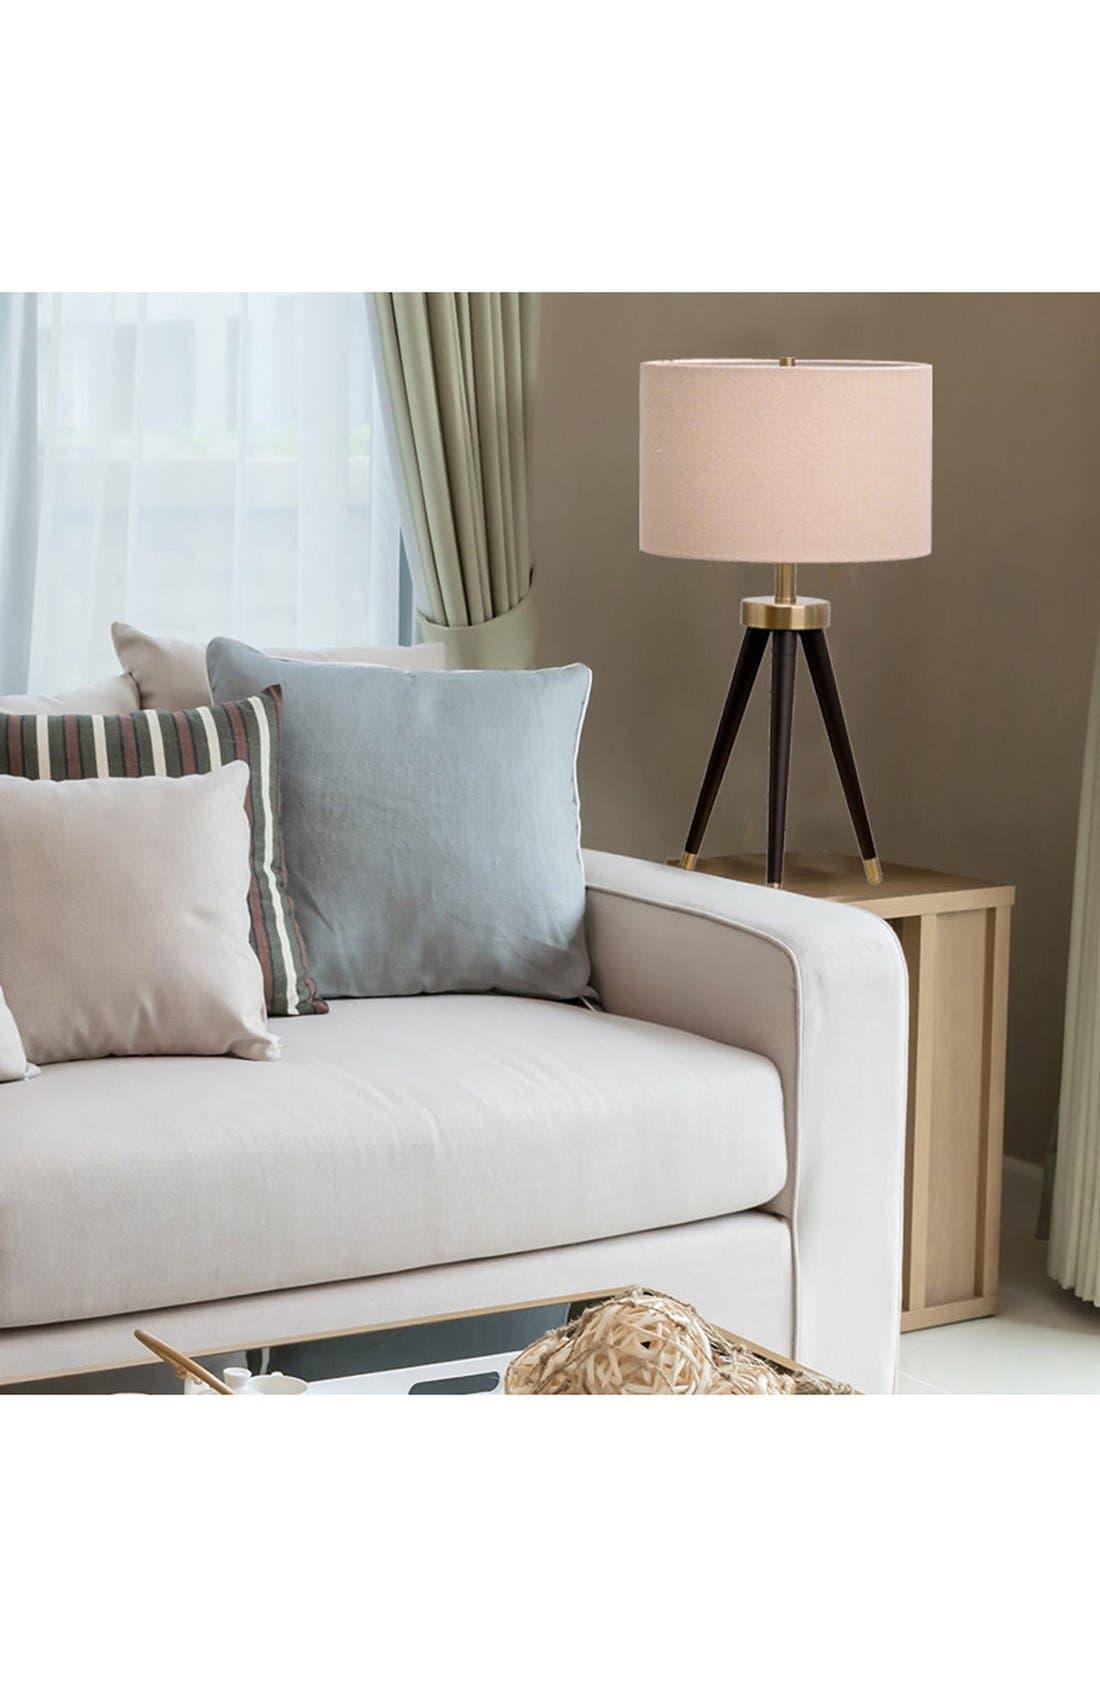 JAlexander Tripod Table Lamp,                             Alternate thumbnail 2, color,                             001